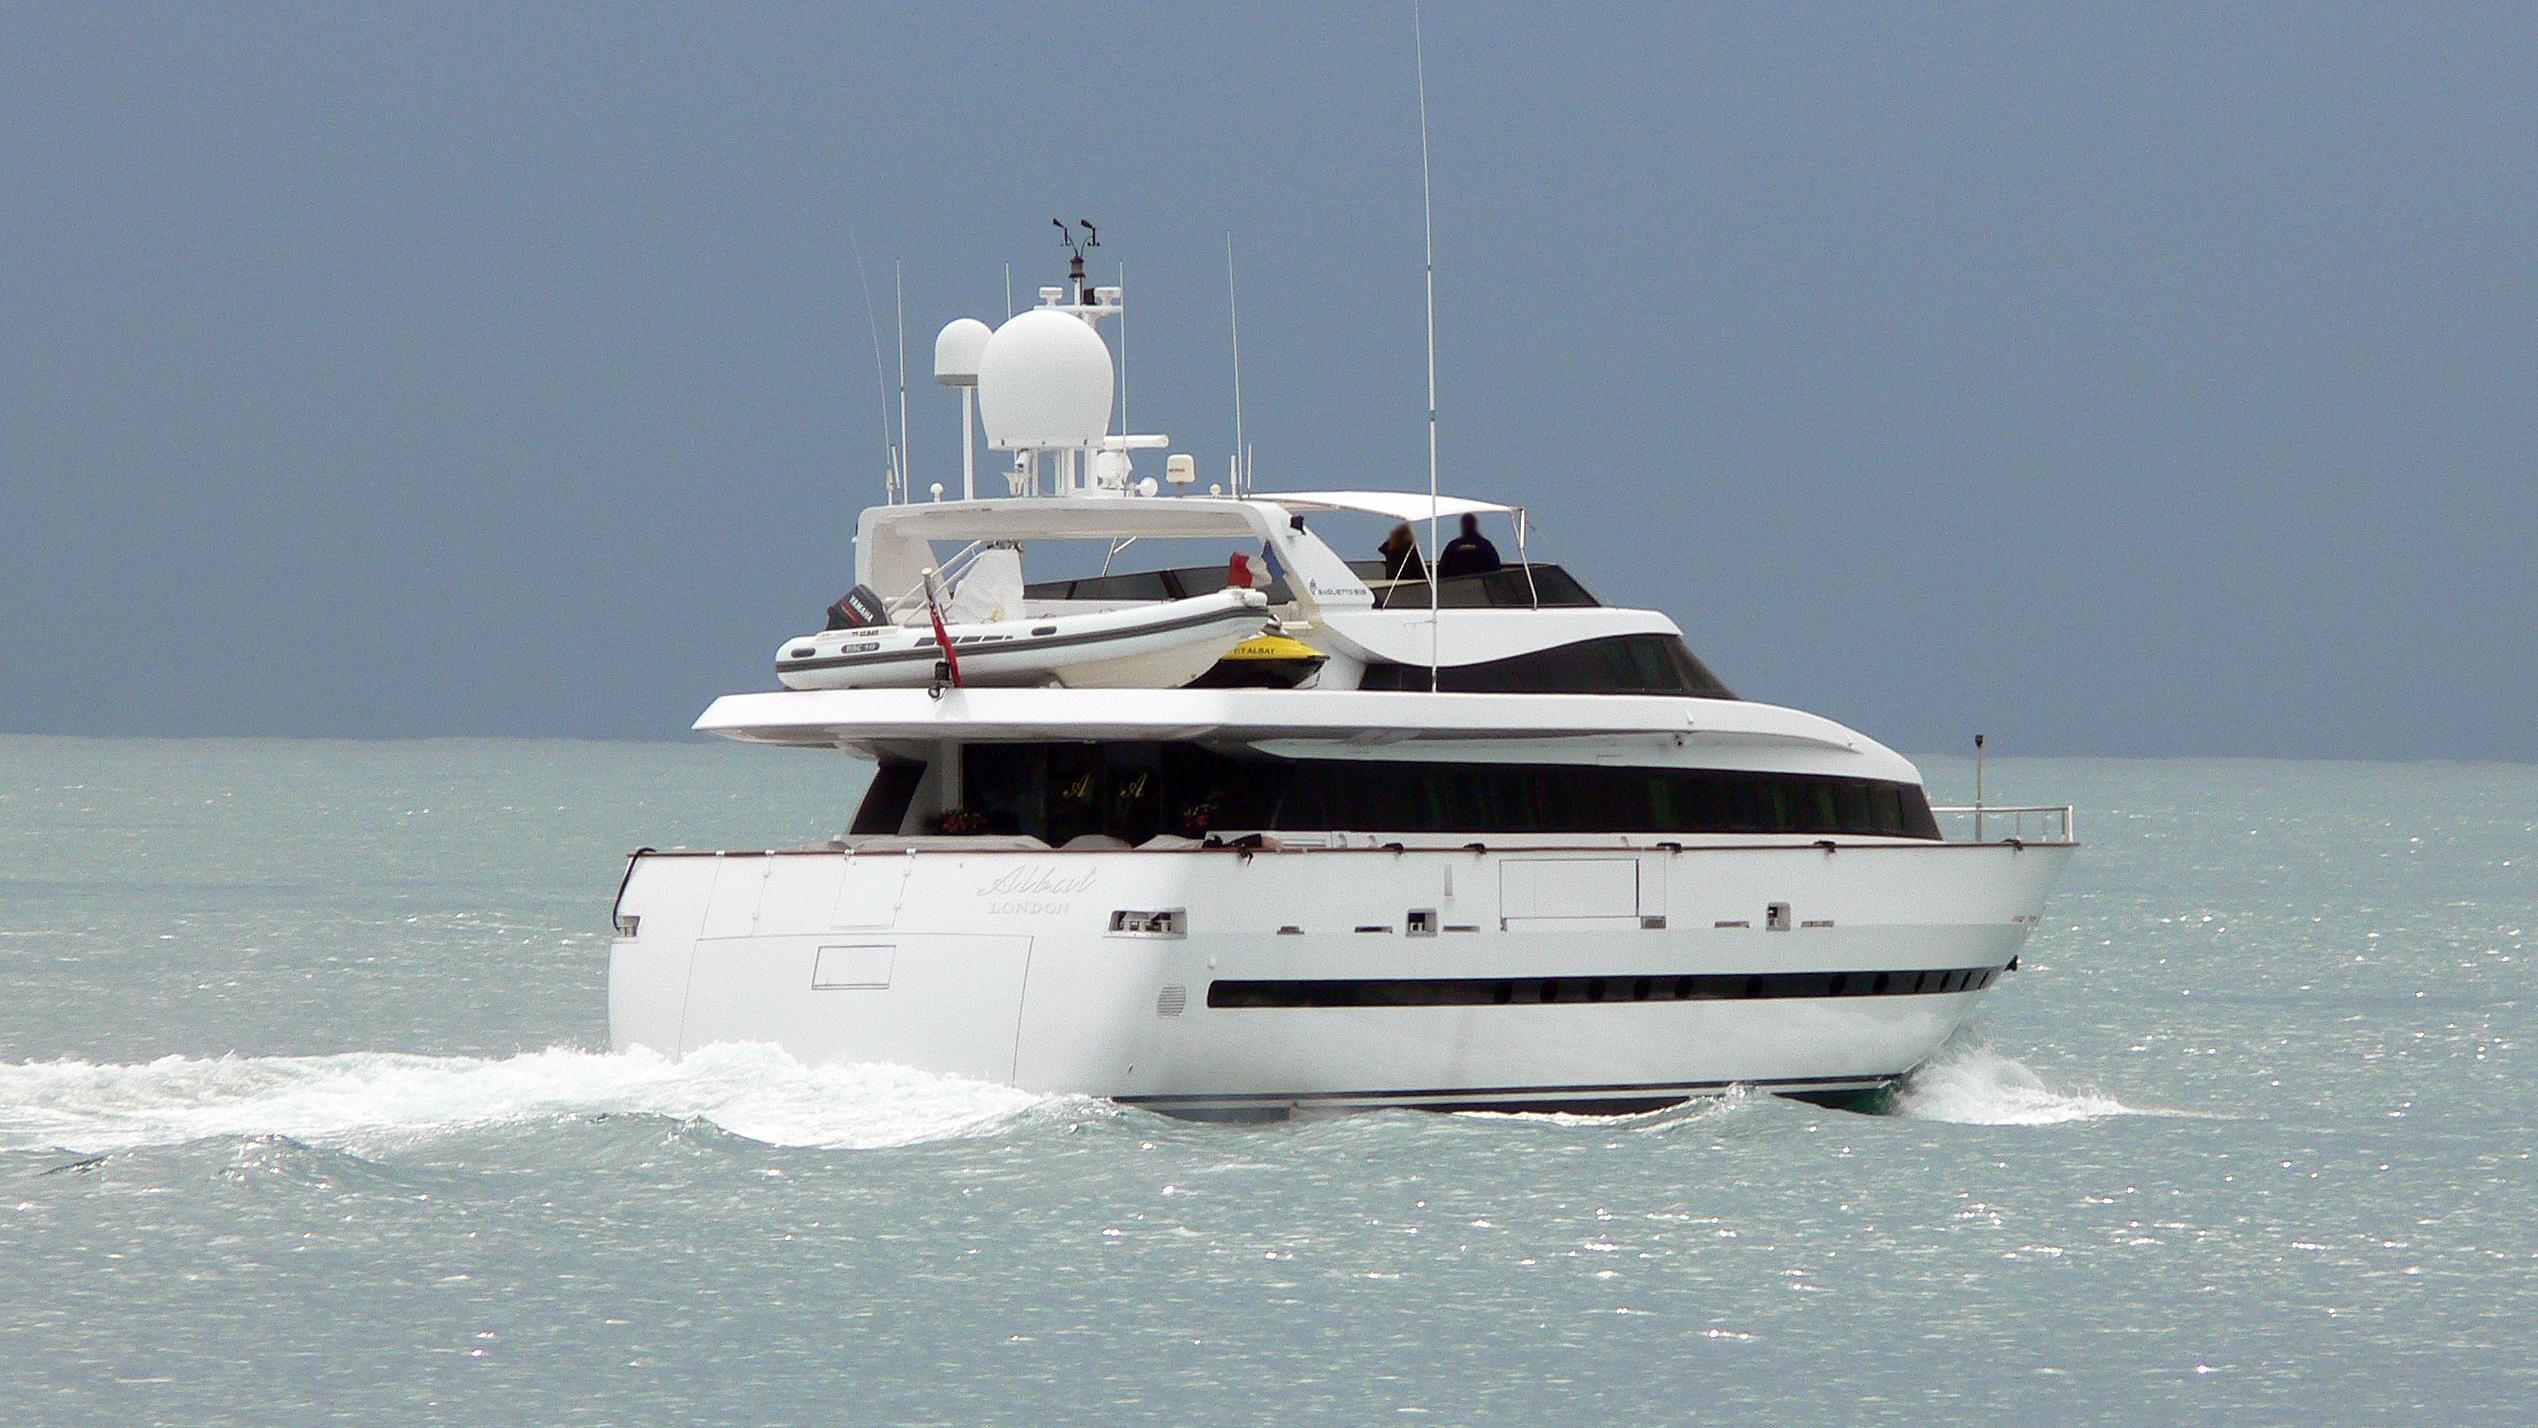 kenayl-ii-motor-yacht-baglietto-30s-1993-30m-cruising-stern